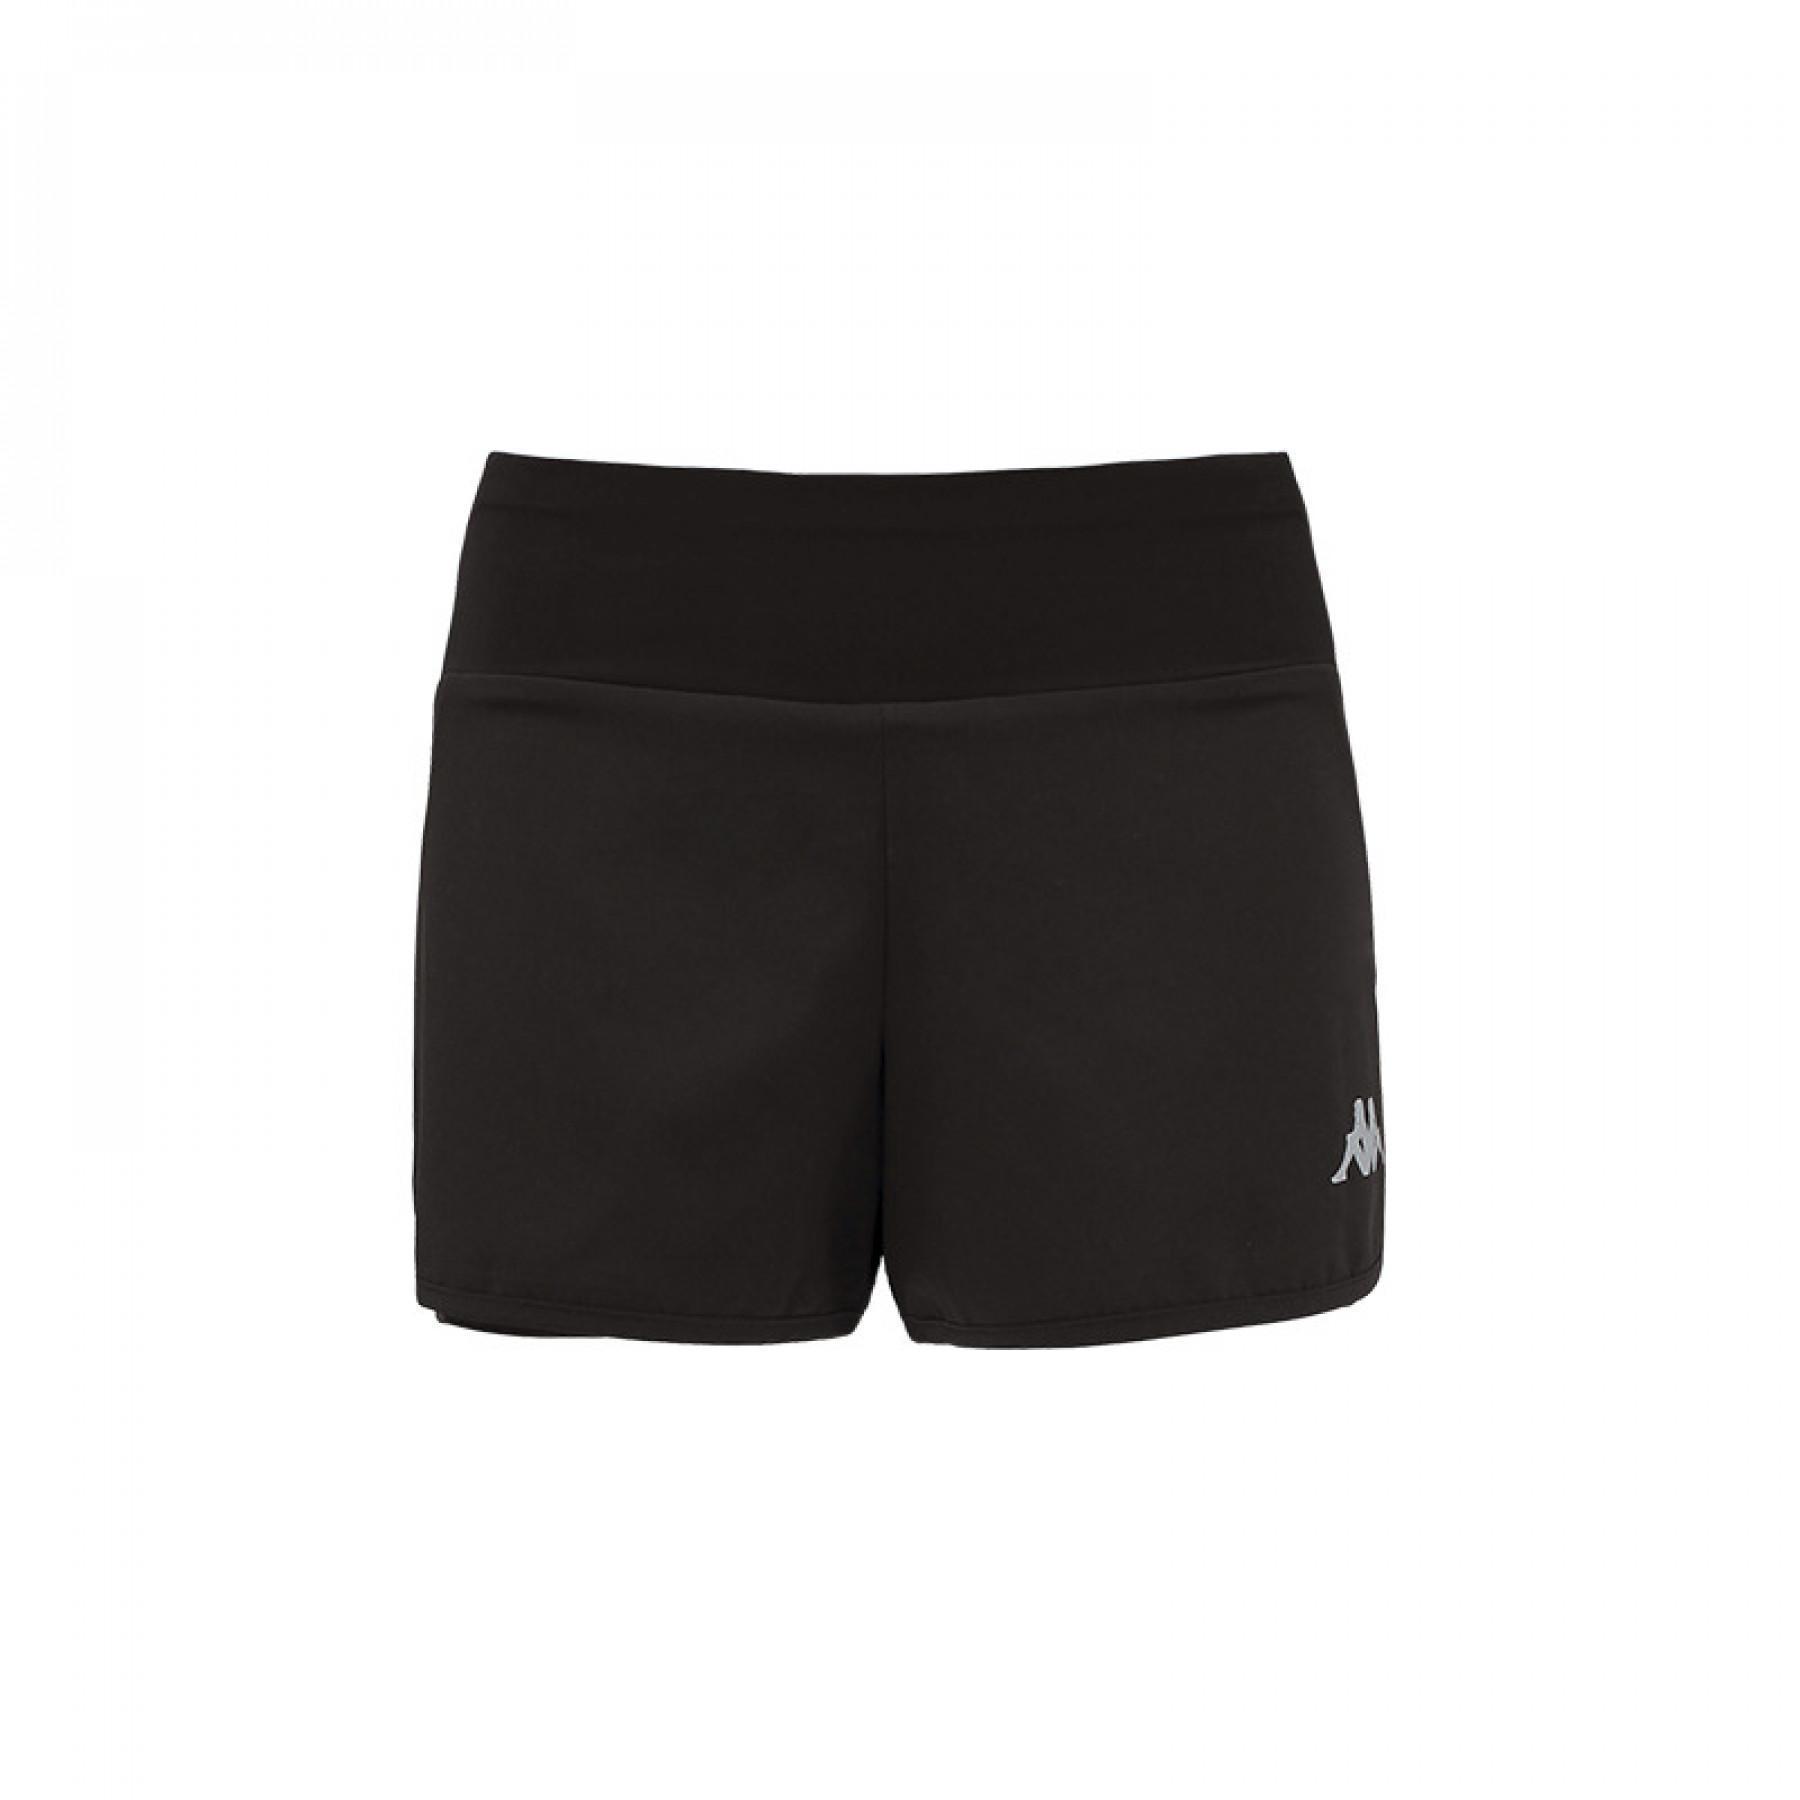 Women's Kappa Falza shorts